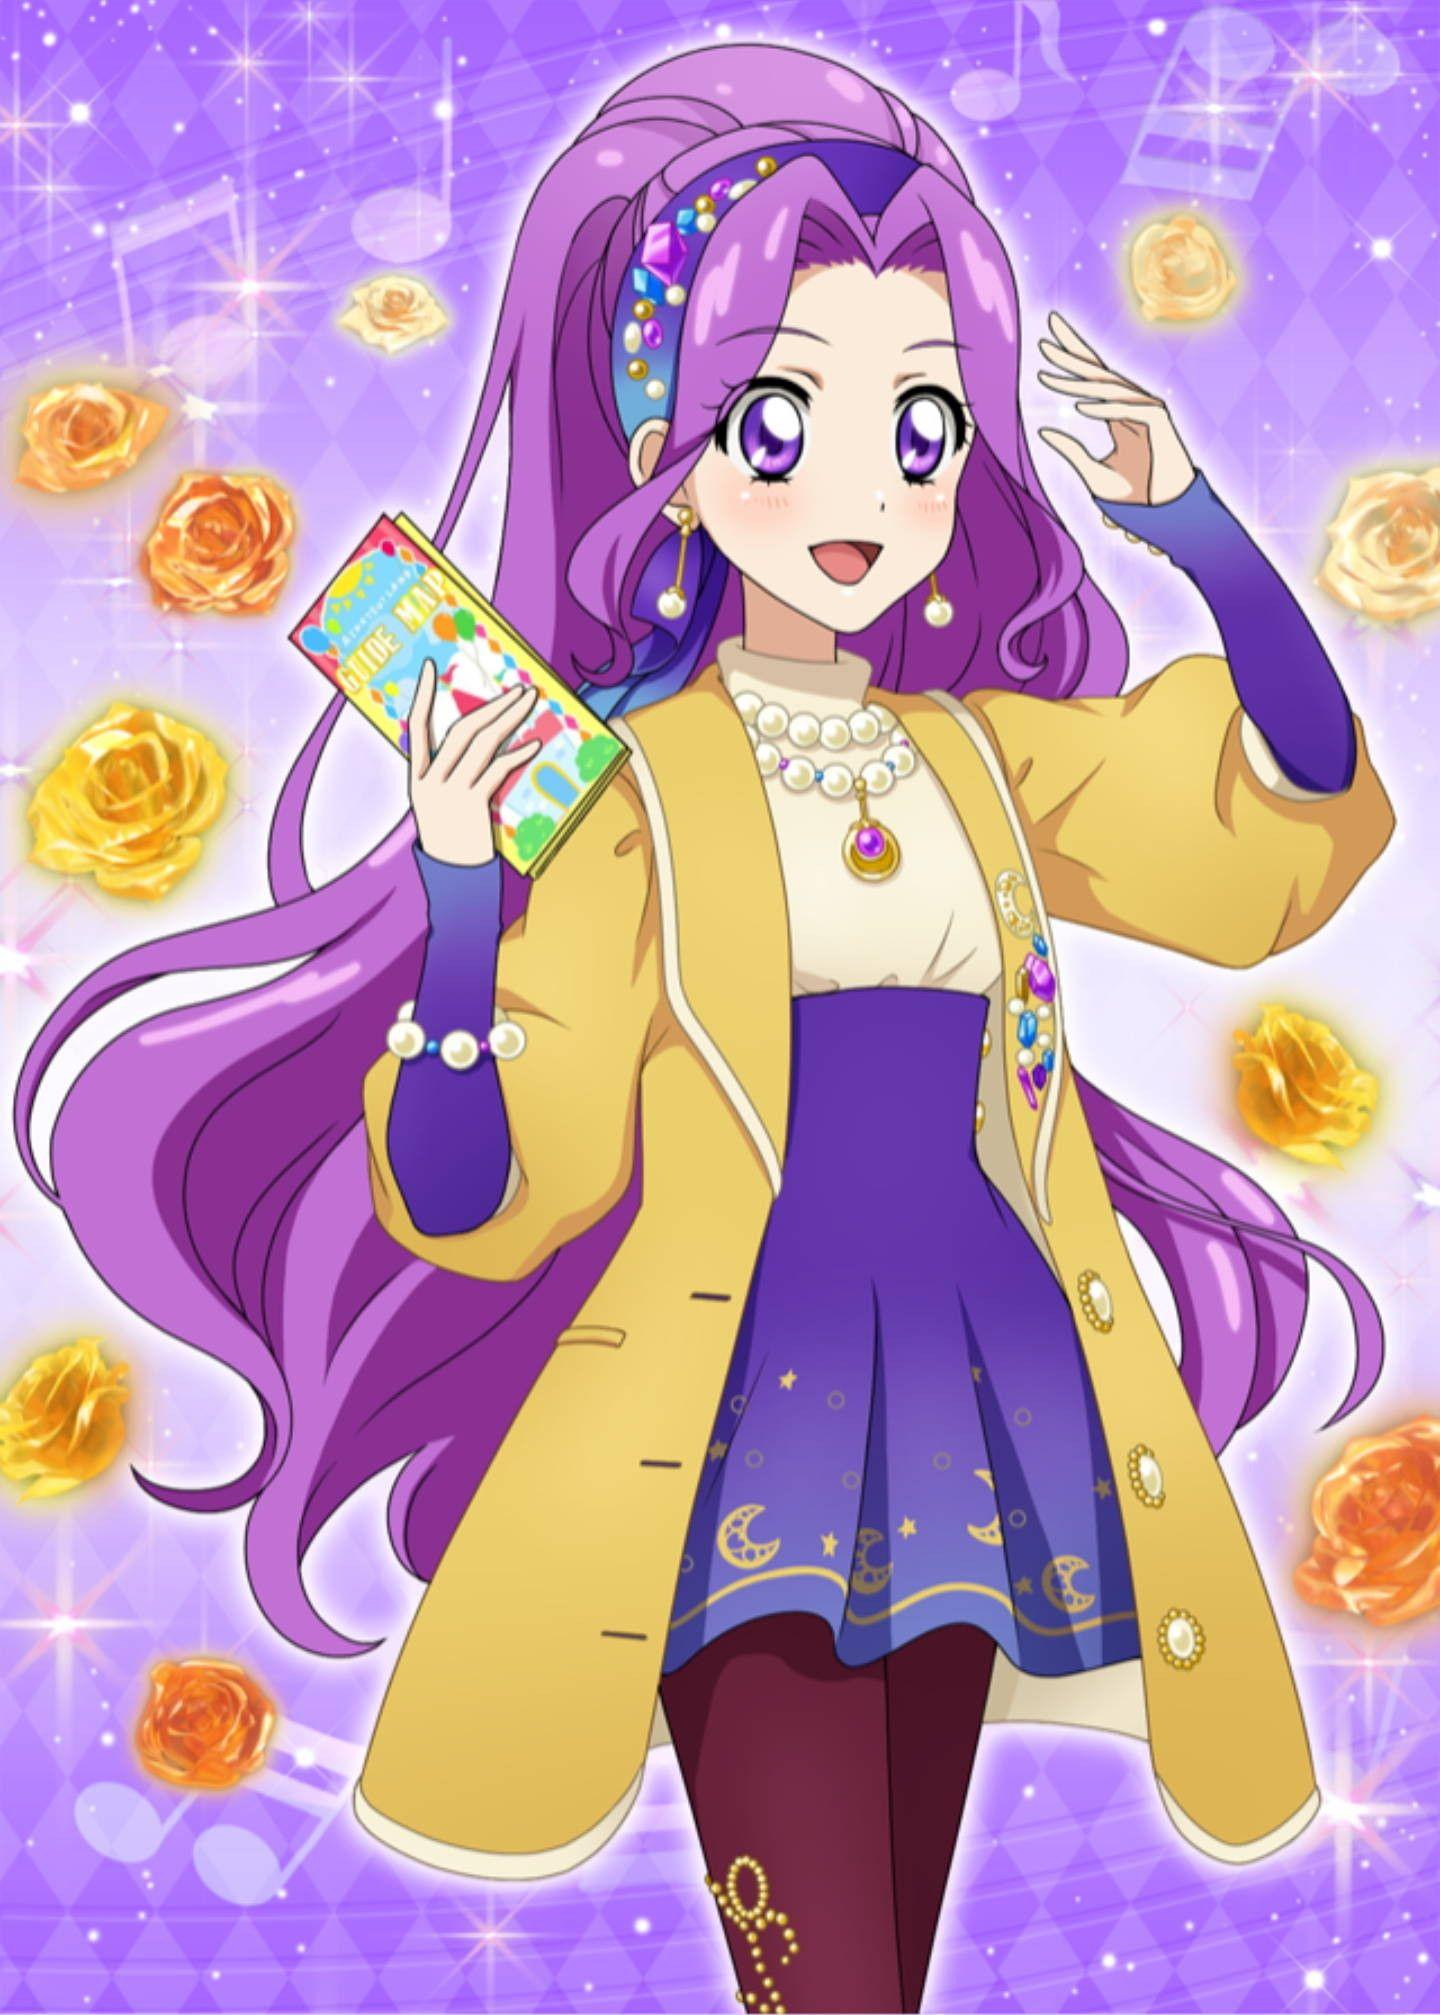 Aikatsu Photo On Stage Cardlist Page 2 Aikatsu Wiki Fandom Trong 2020 Anime Xử Nữ Dễ Thương